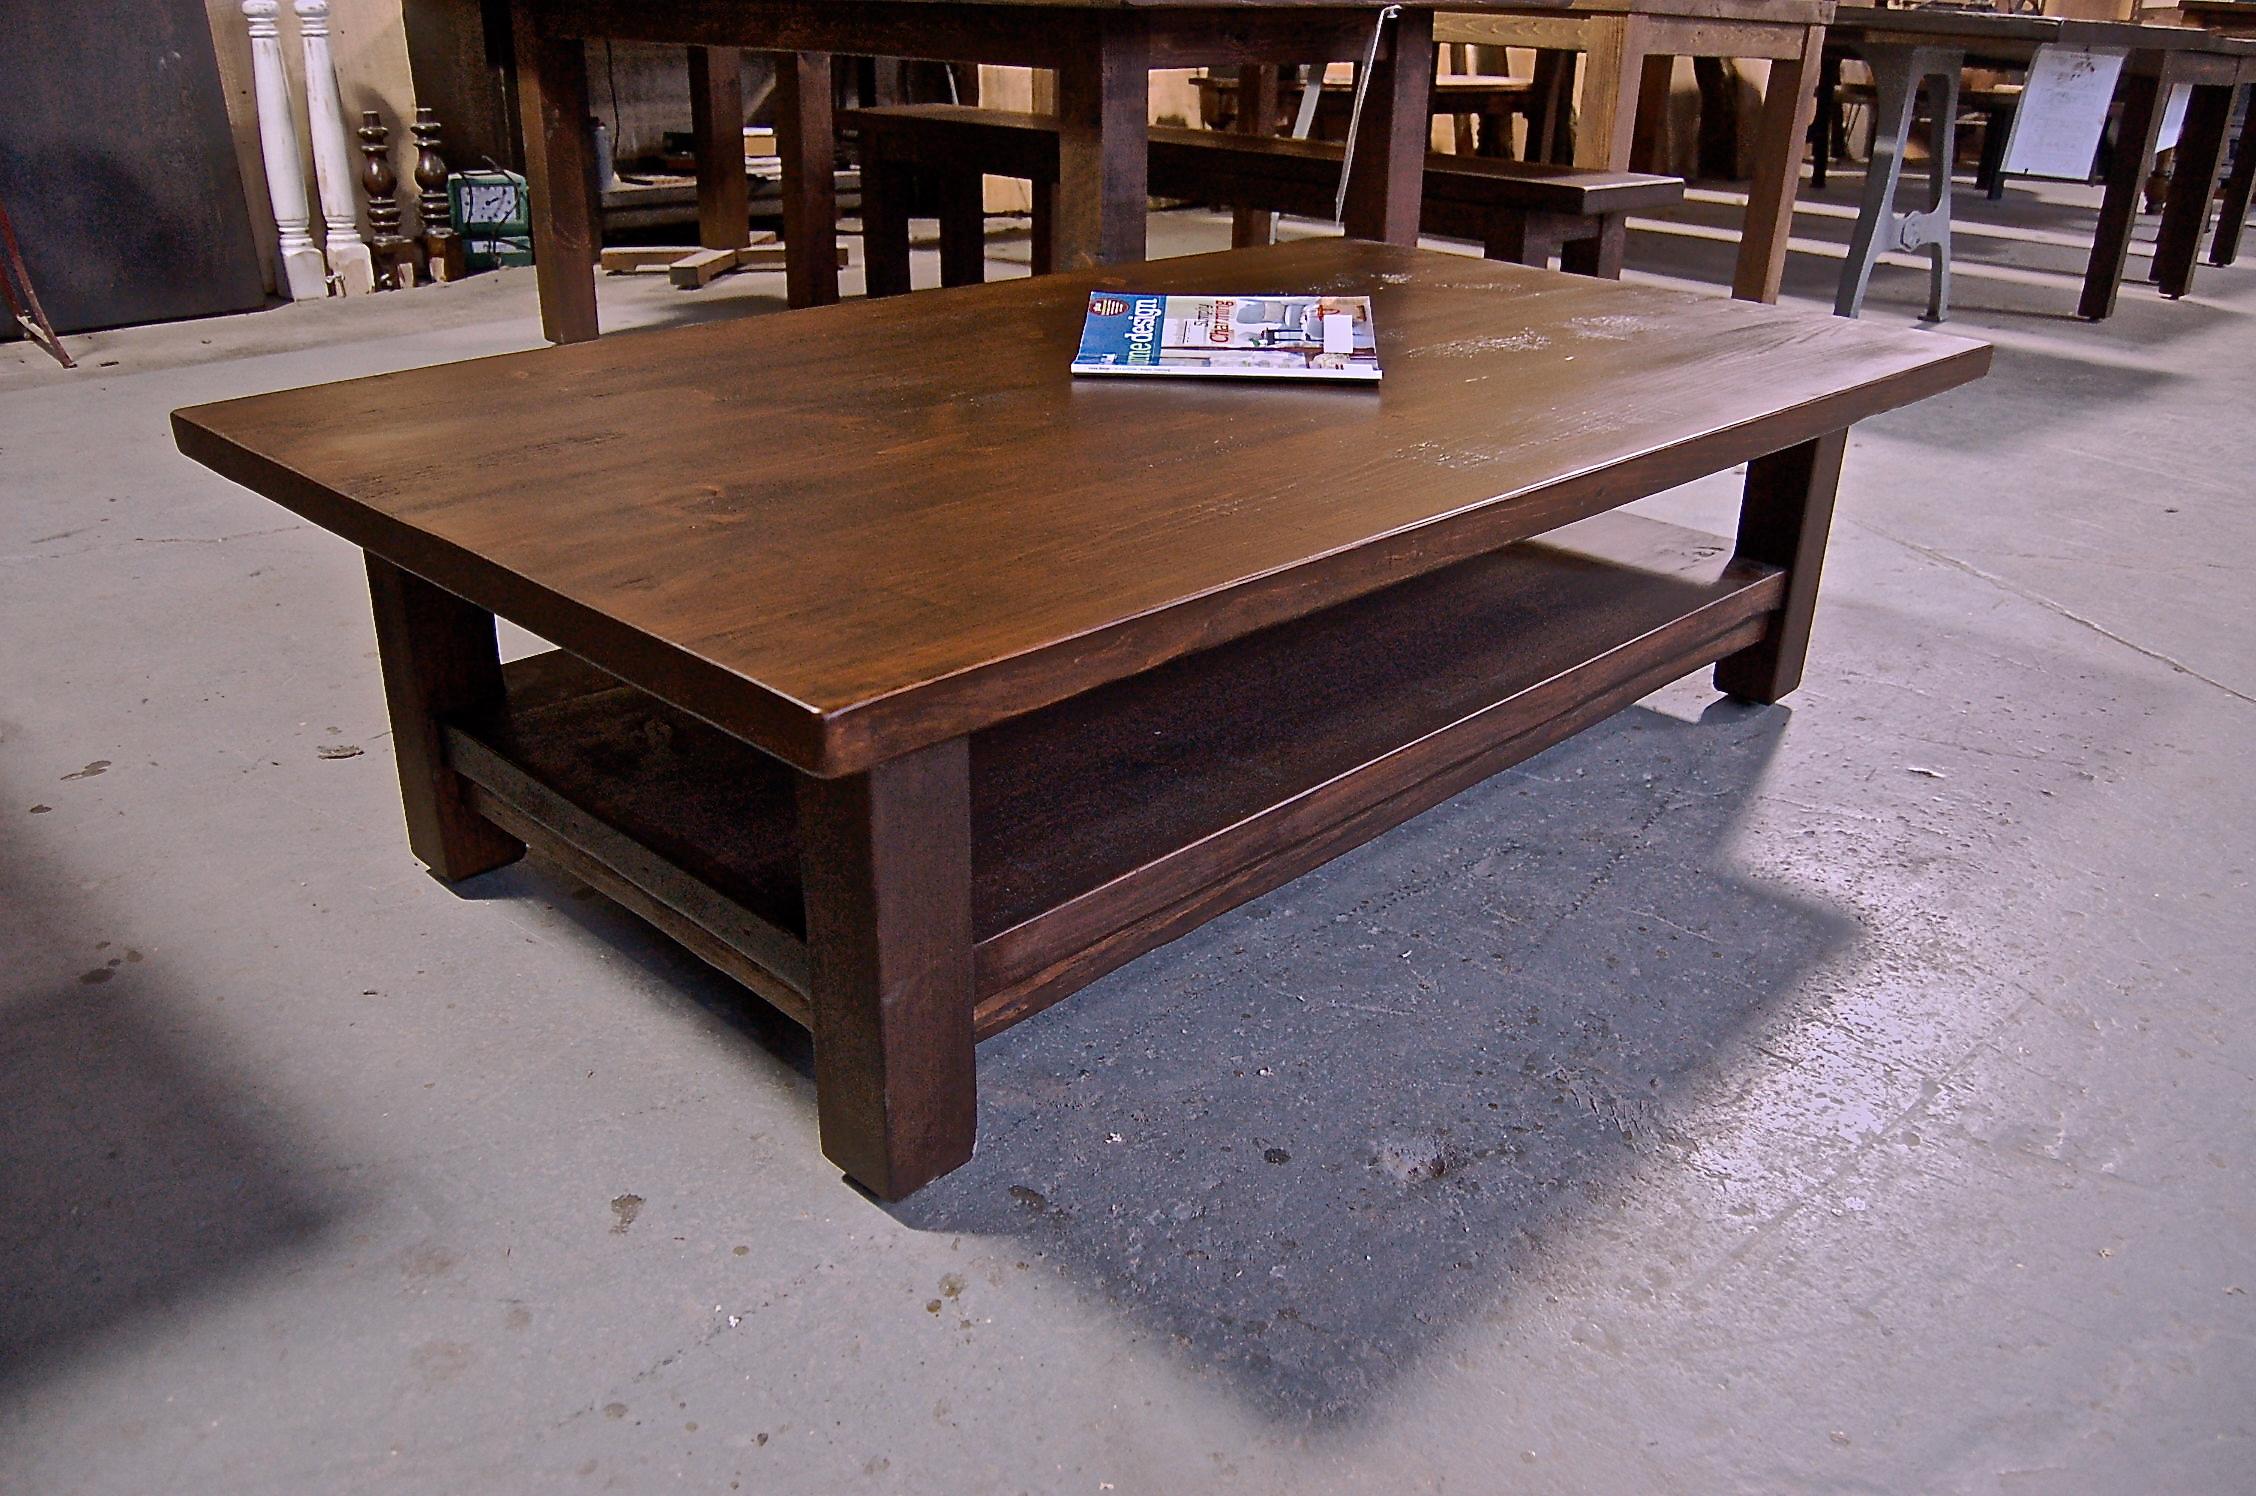 Pine coffee table with lower shelf